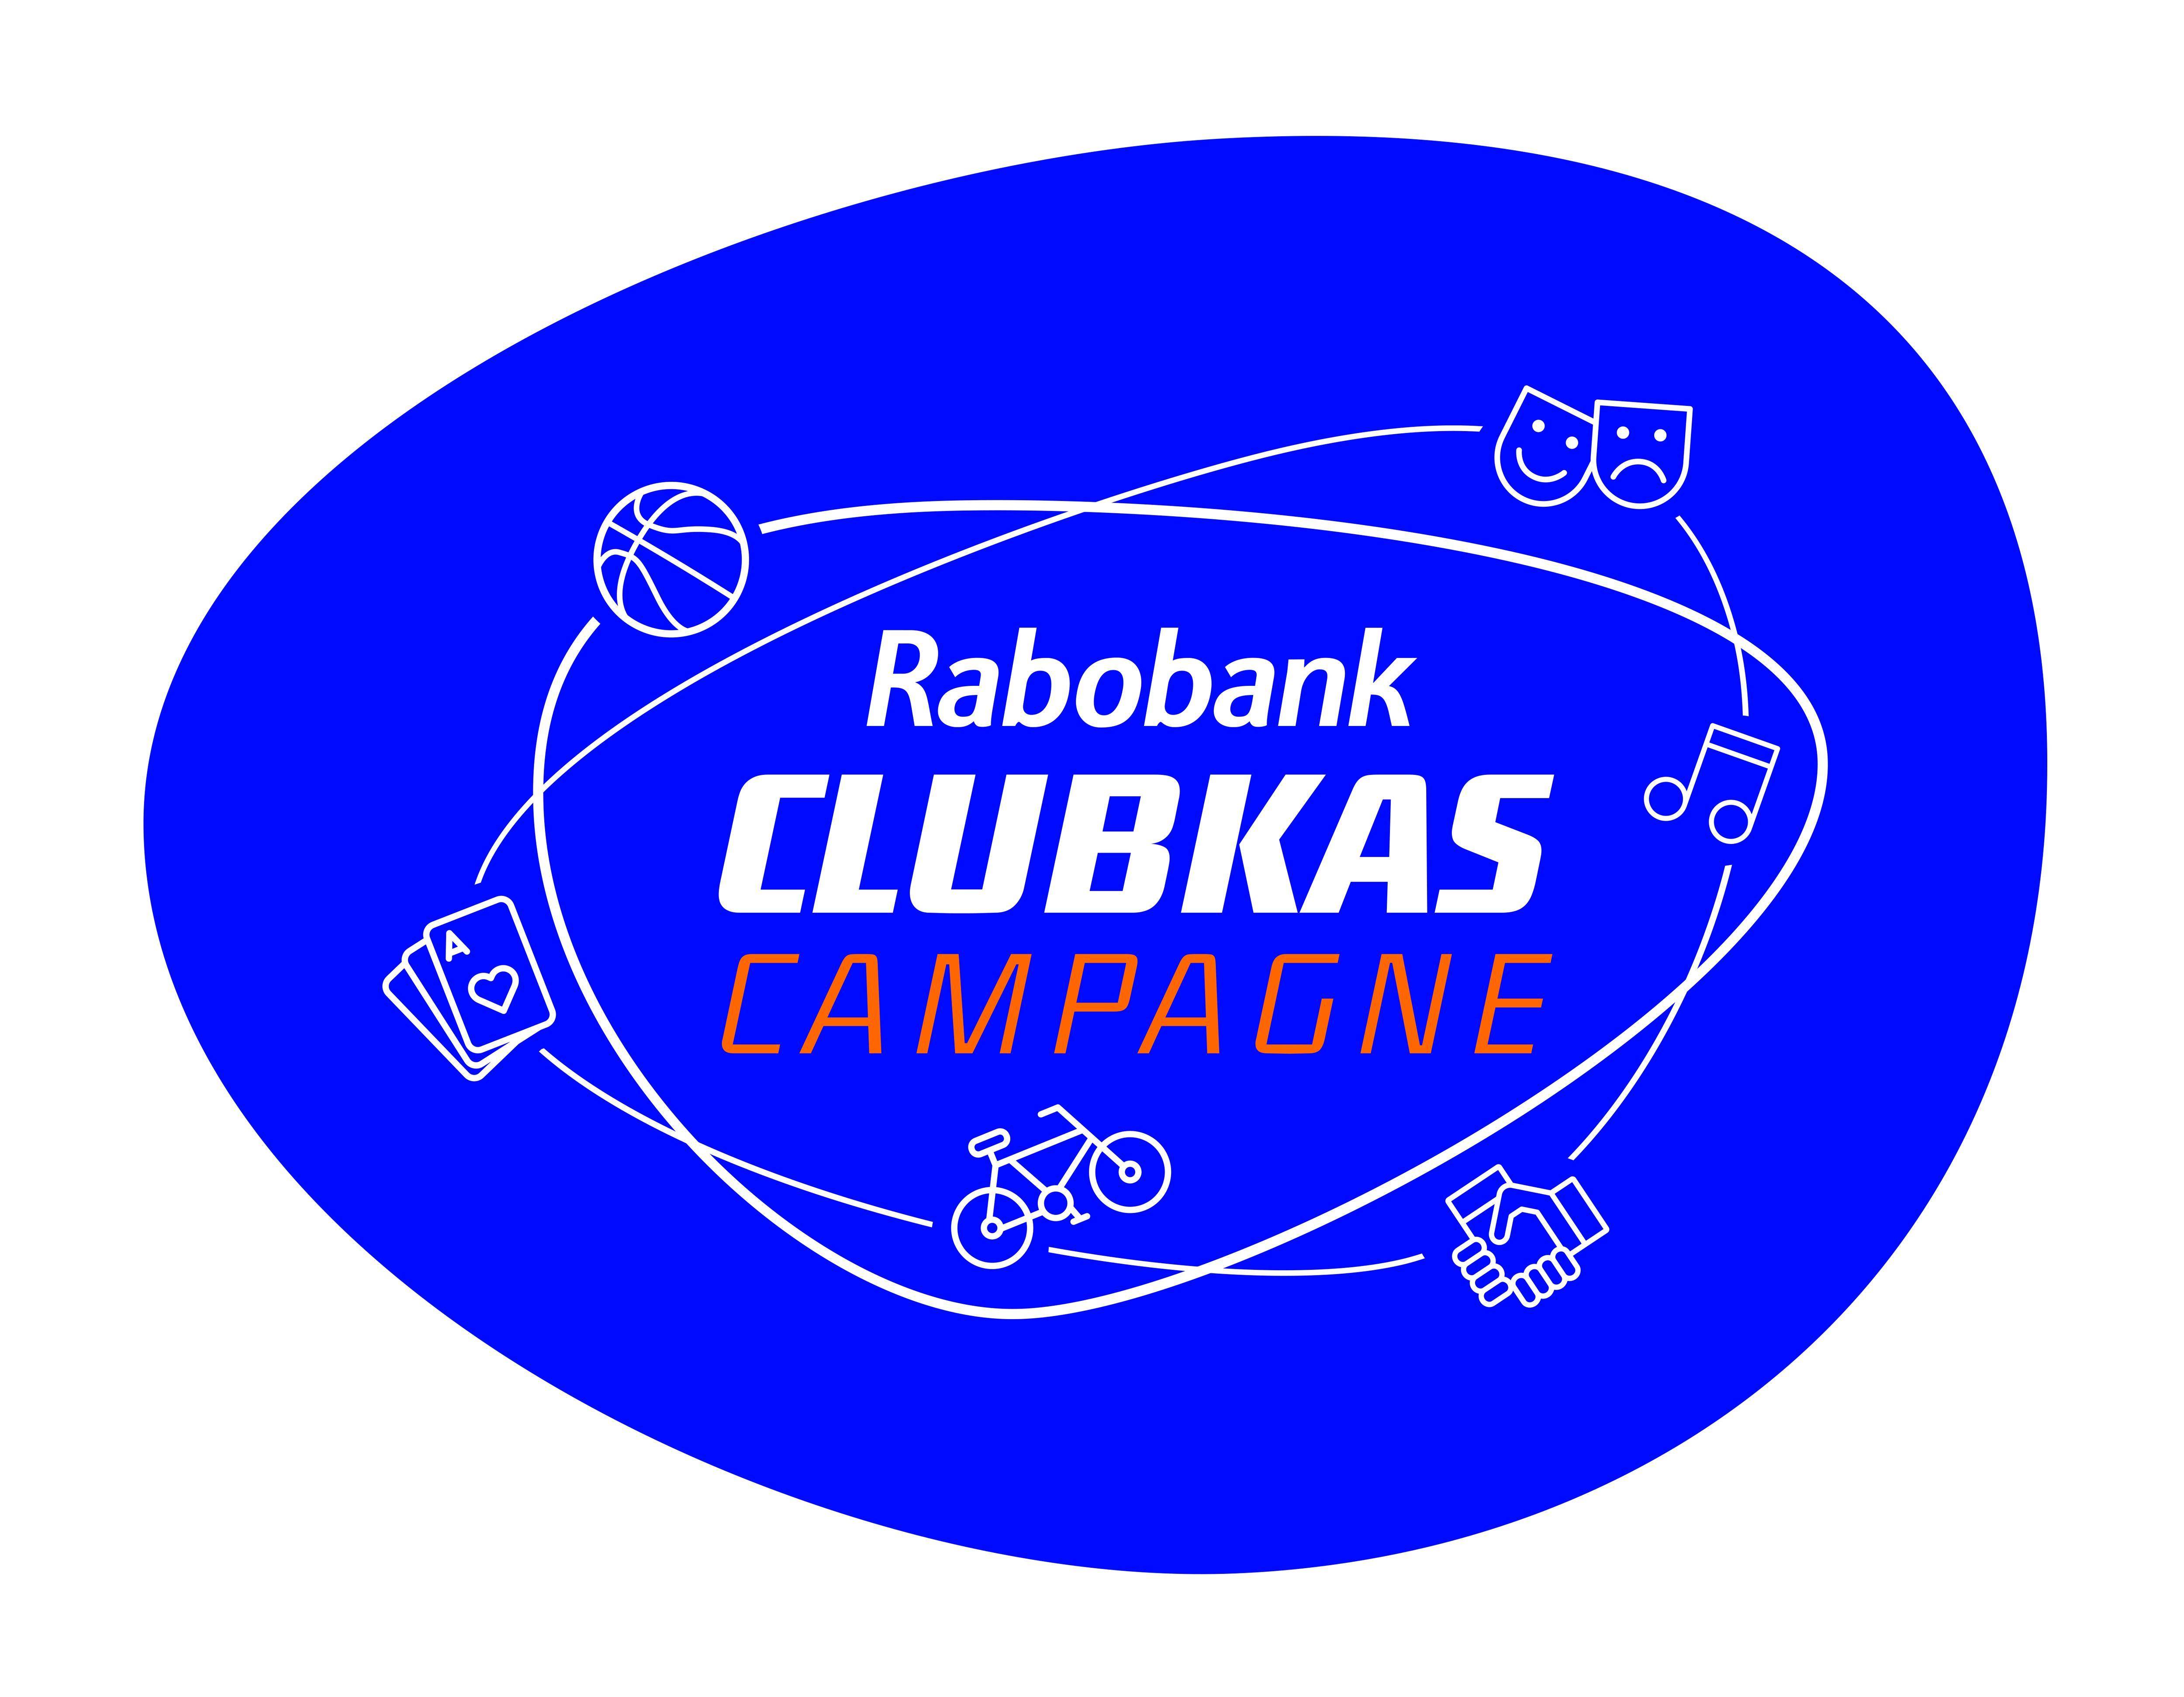 Rabo Clubkascampagne 2016